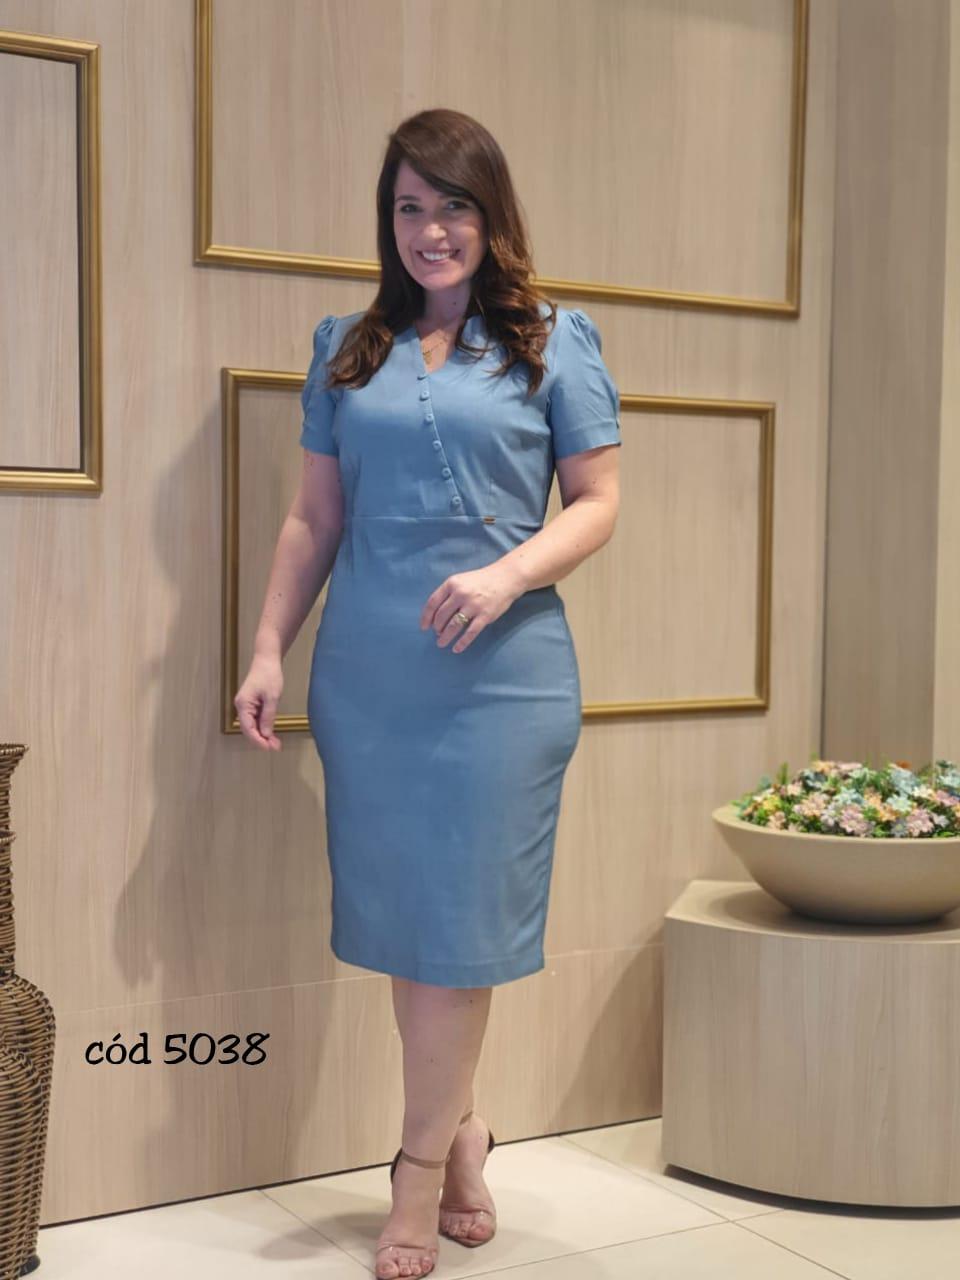 Vestido Em Twill Spam - Moda Evangélica Cechiq (5038 T)